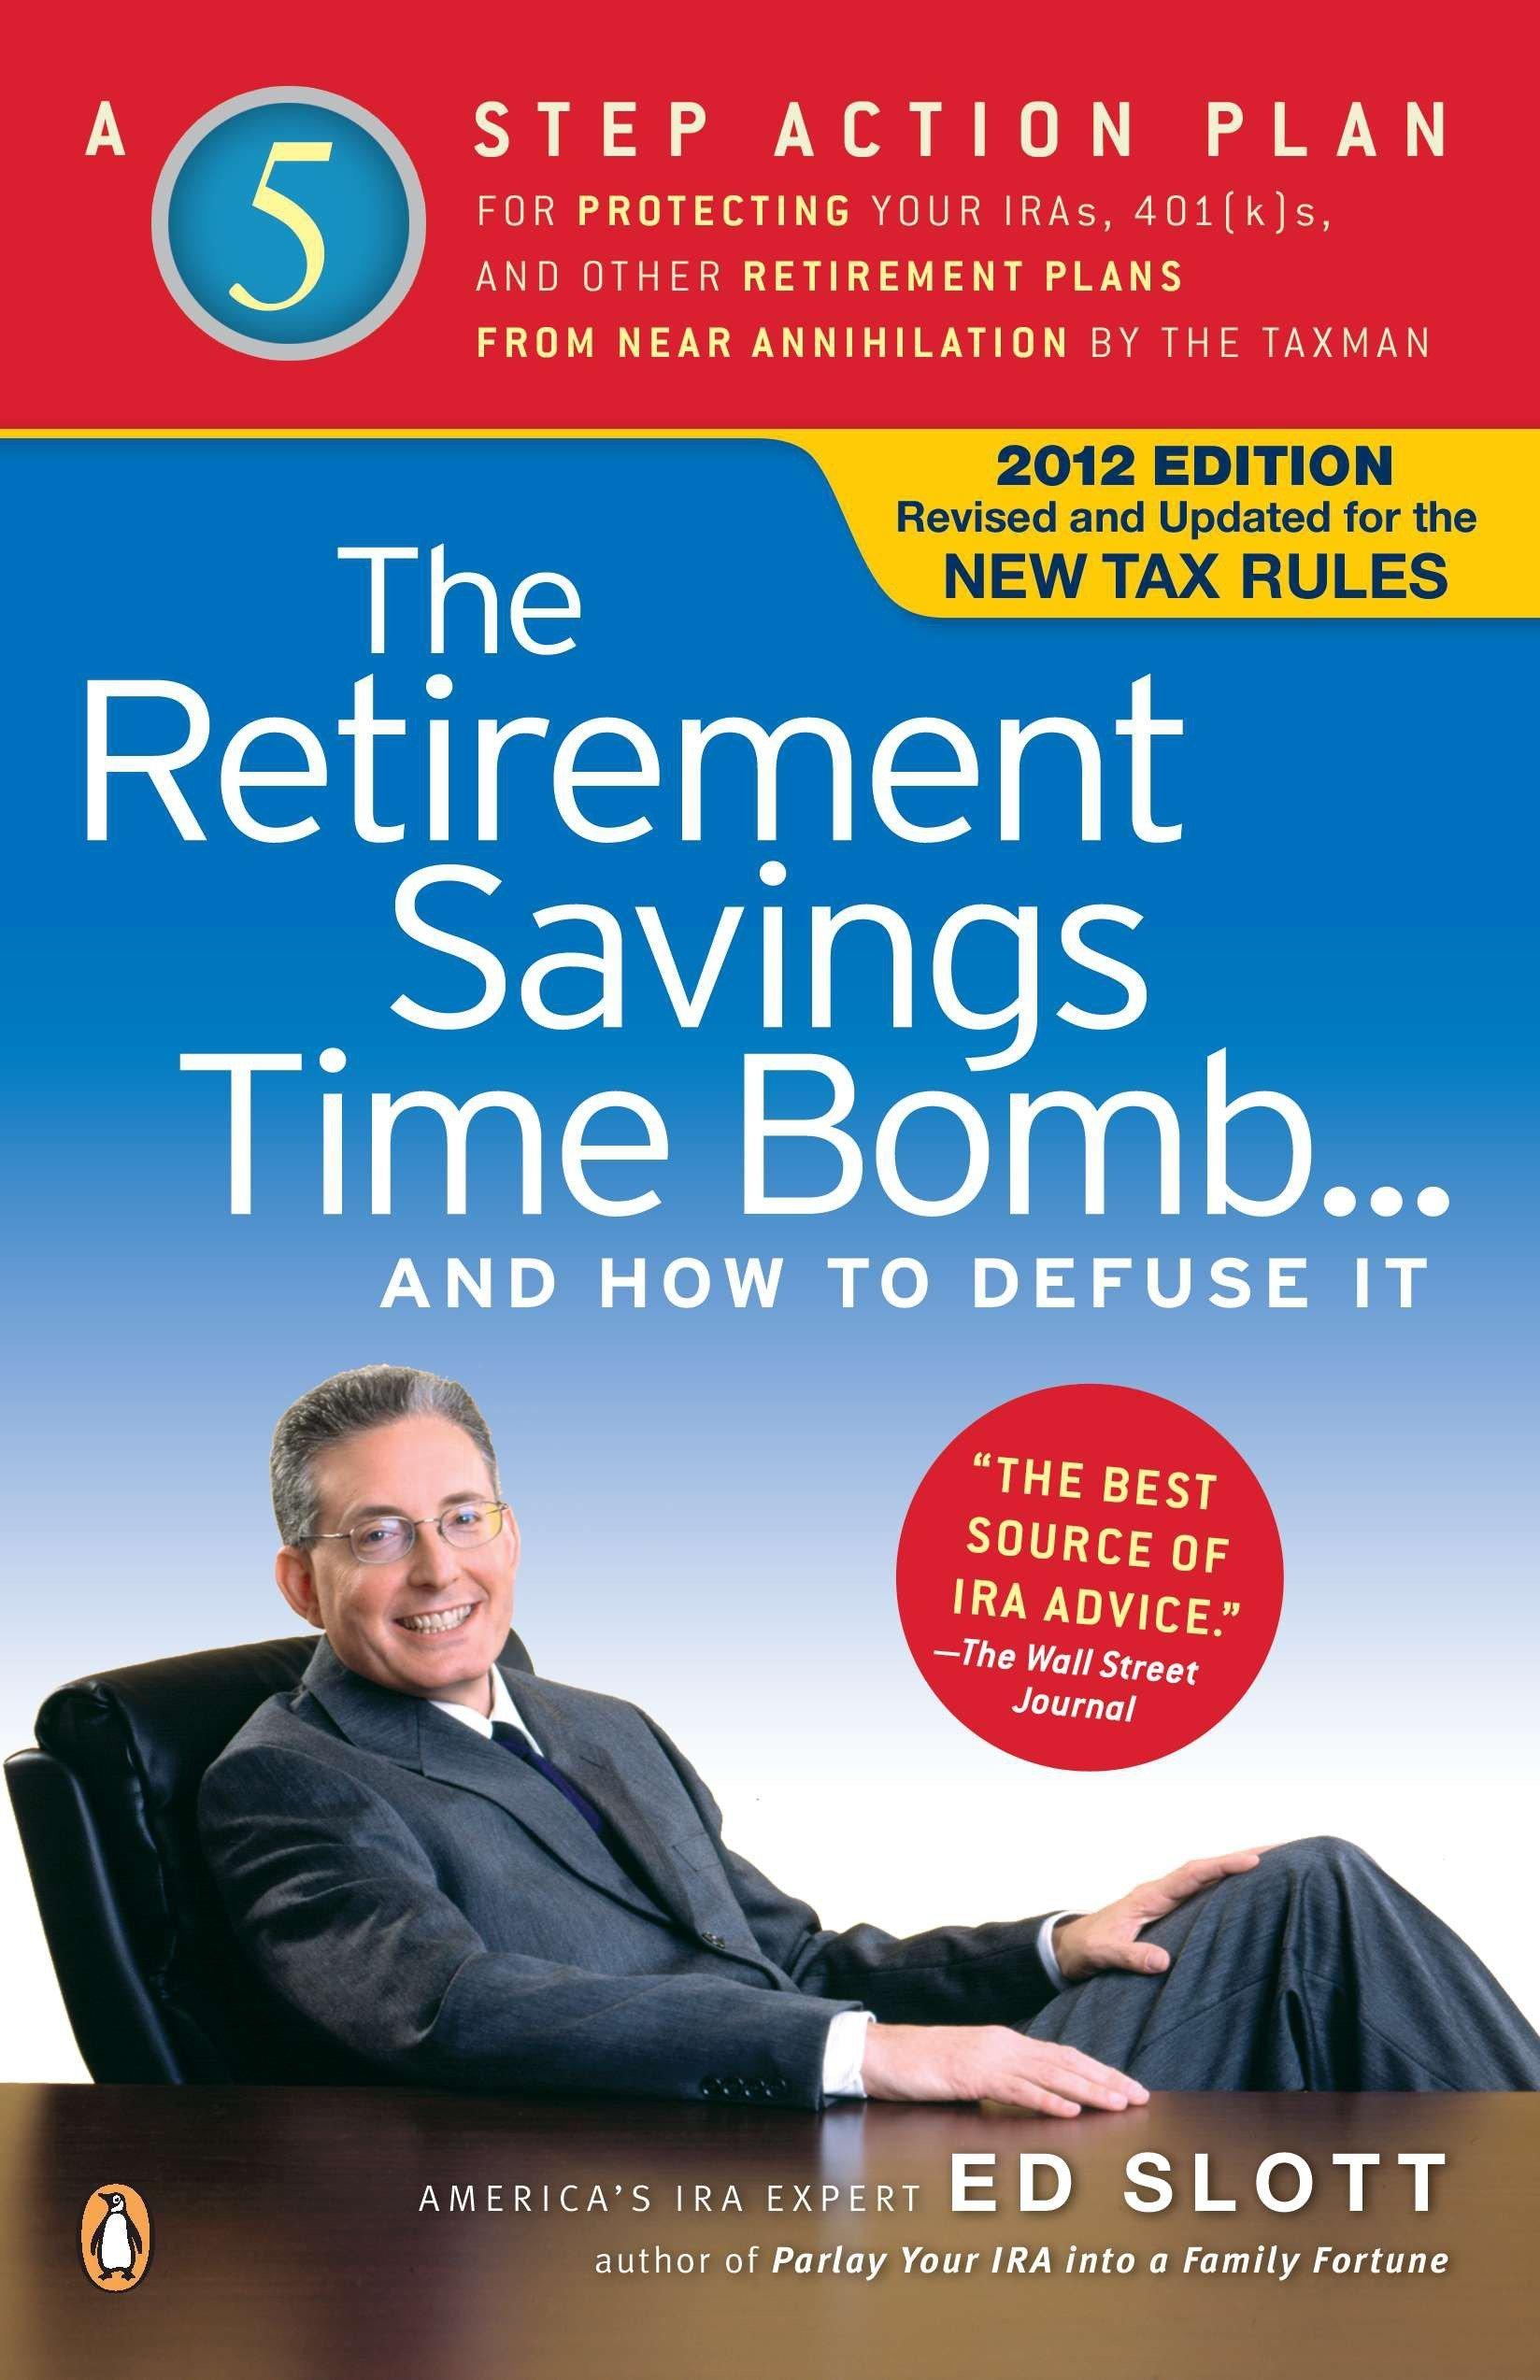 Retirement Savings Time Bomb Defuse product image